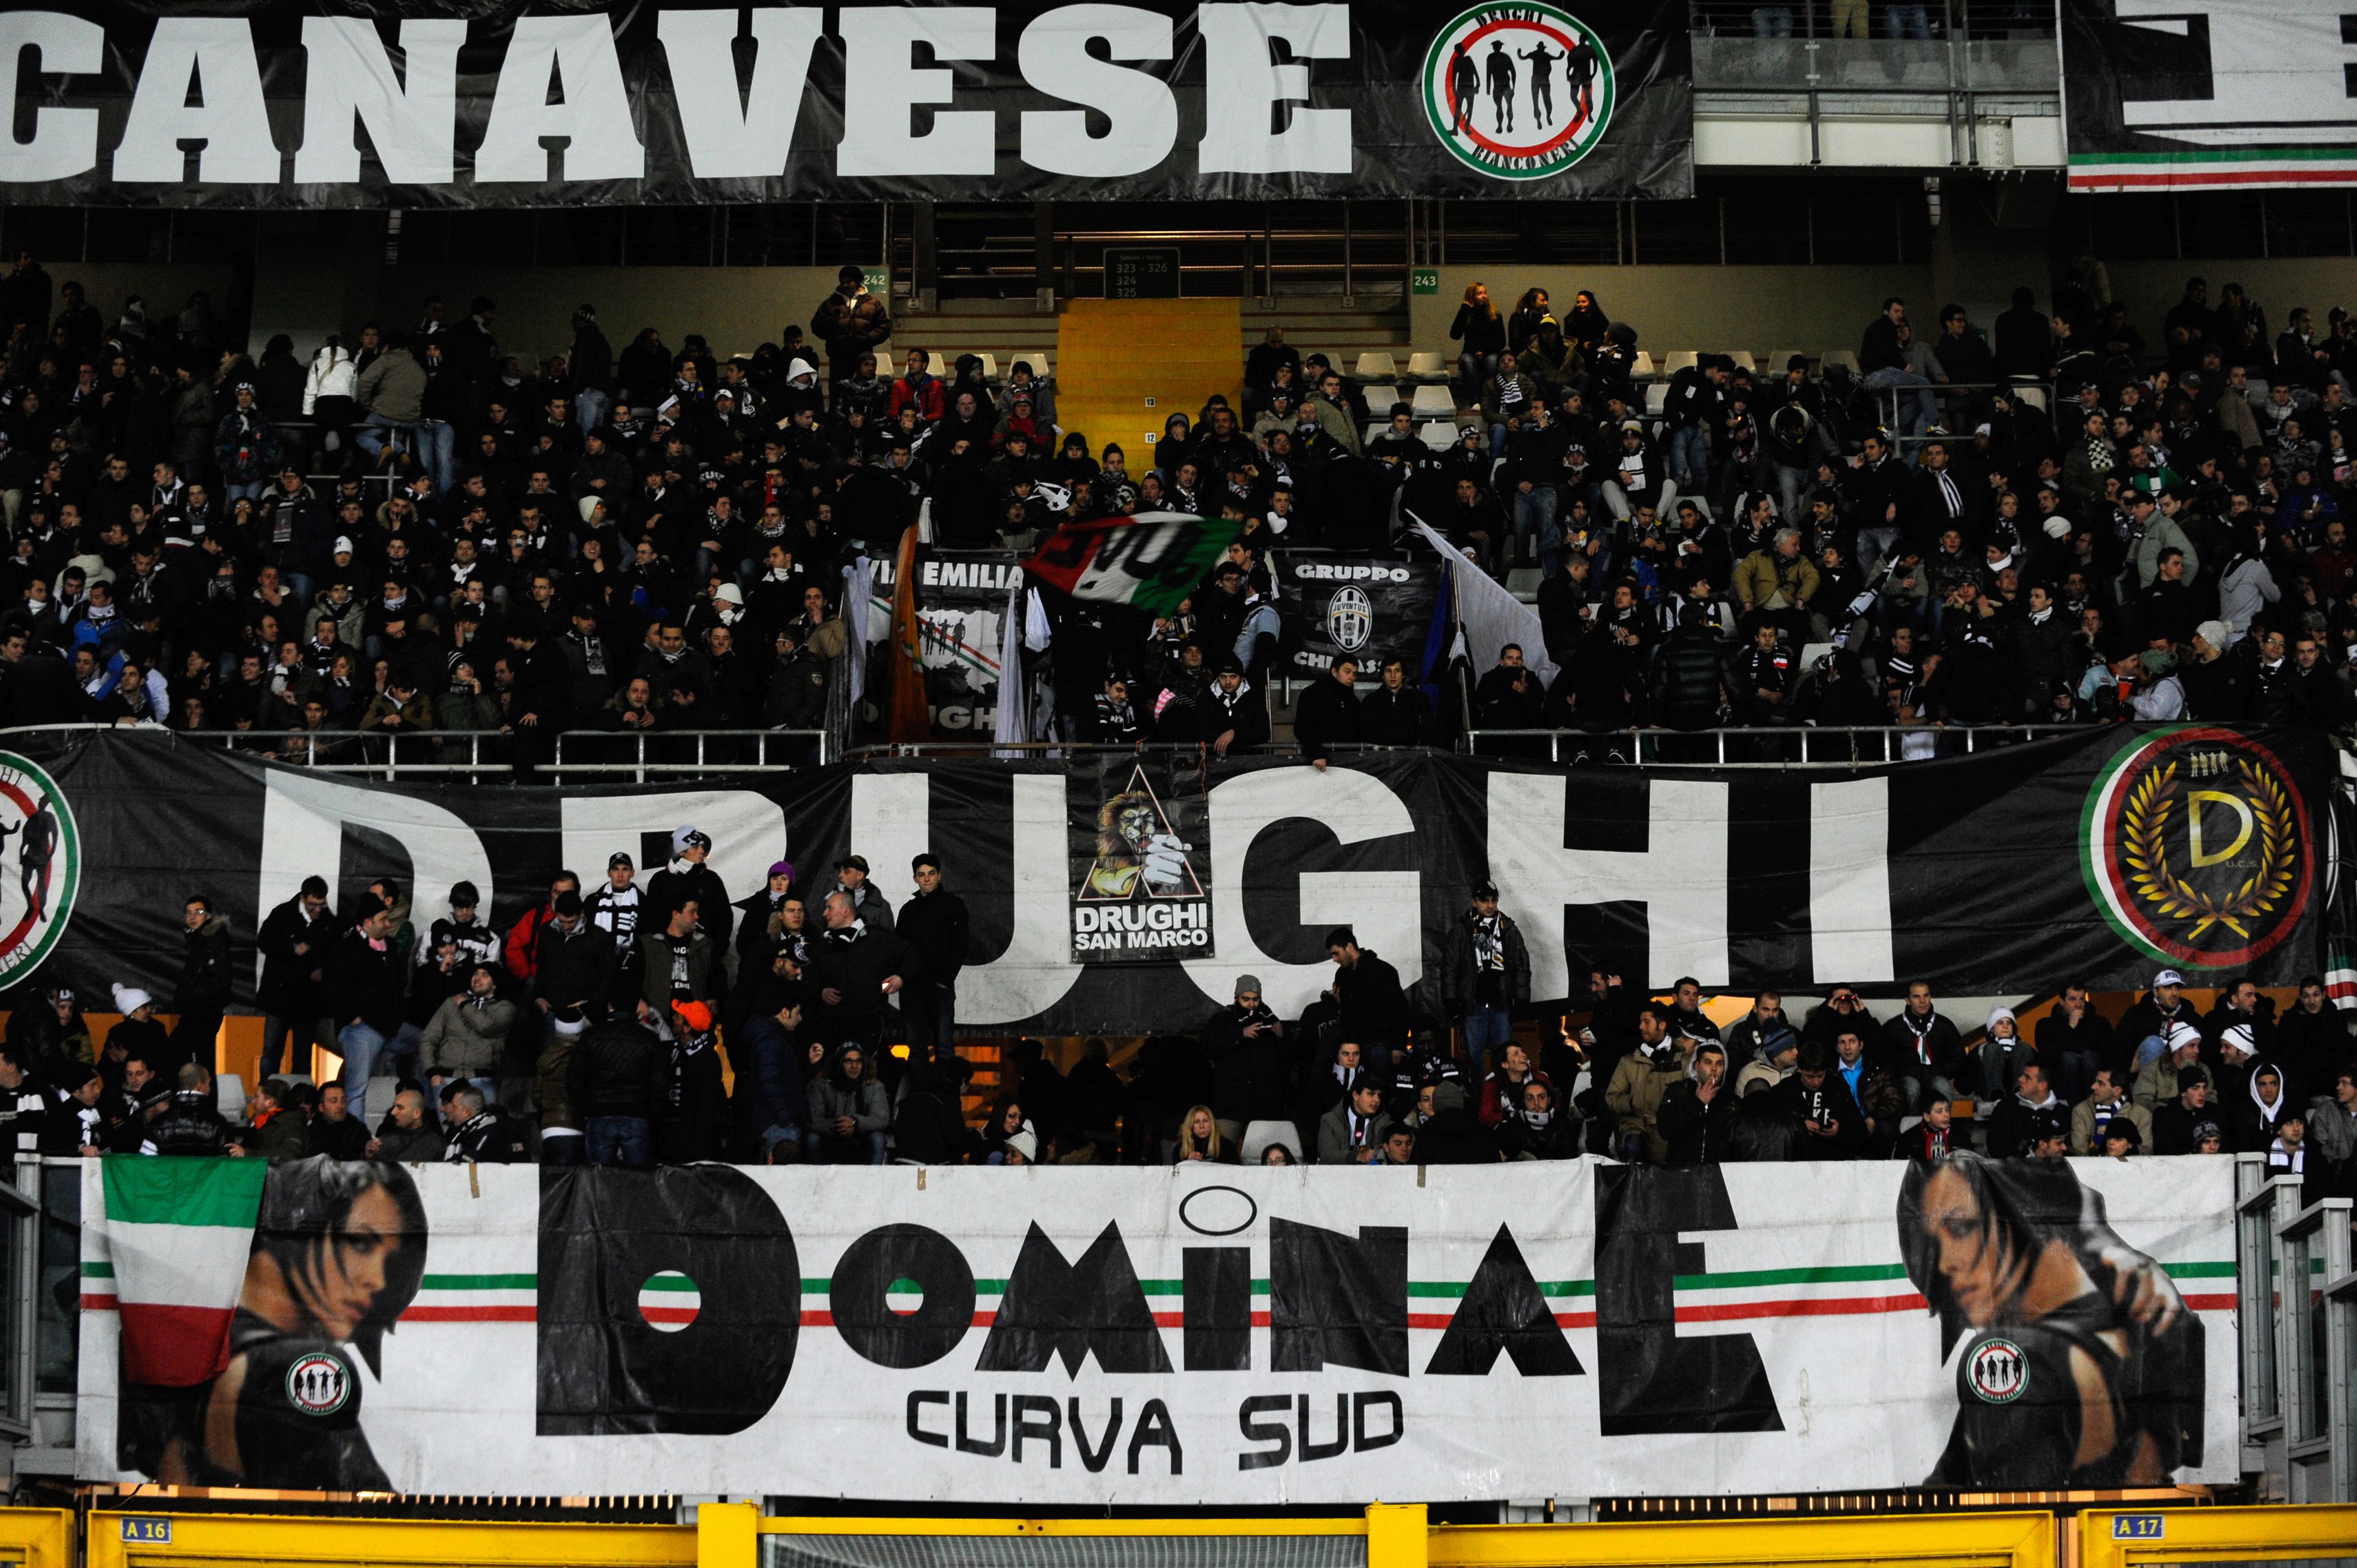 Soccer - UEFA Europa League - Juventus vs. Ajax